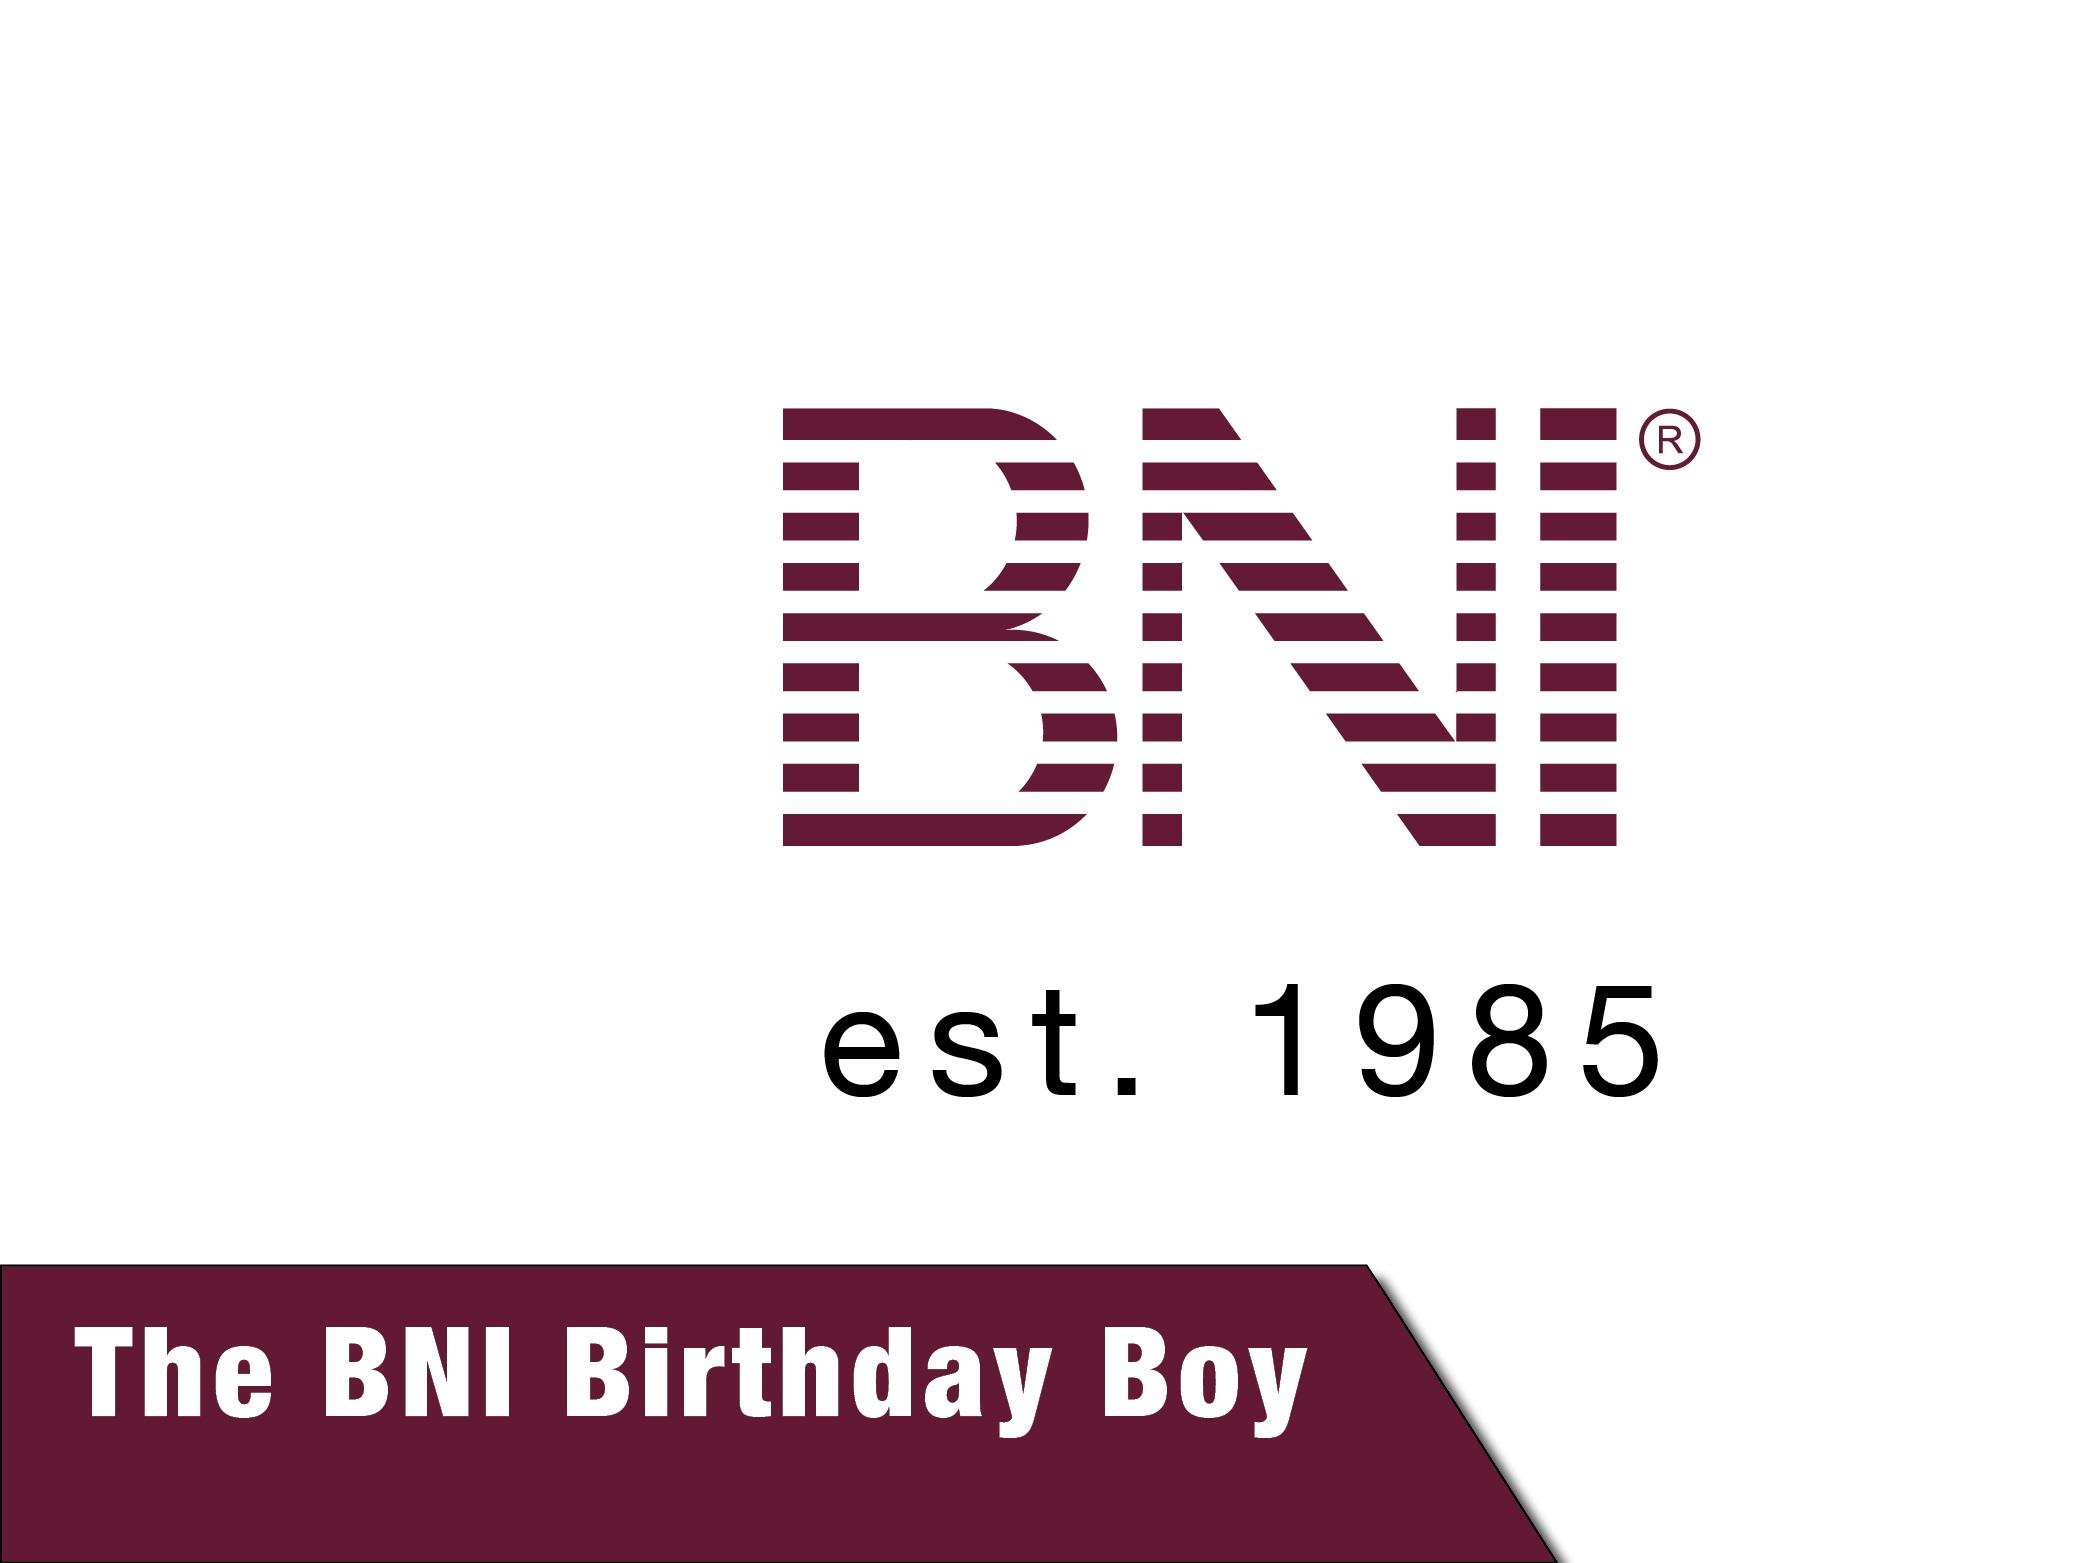 The BNI Birthday Boy